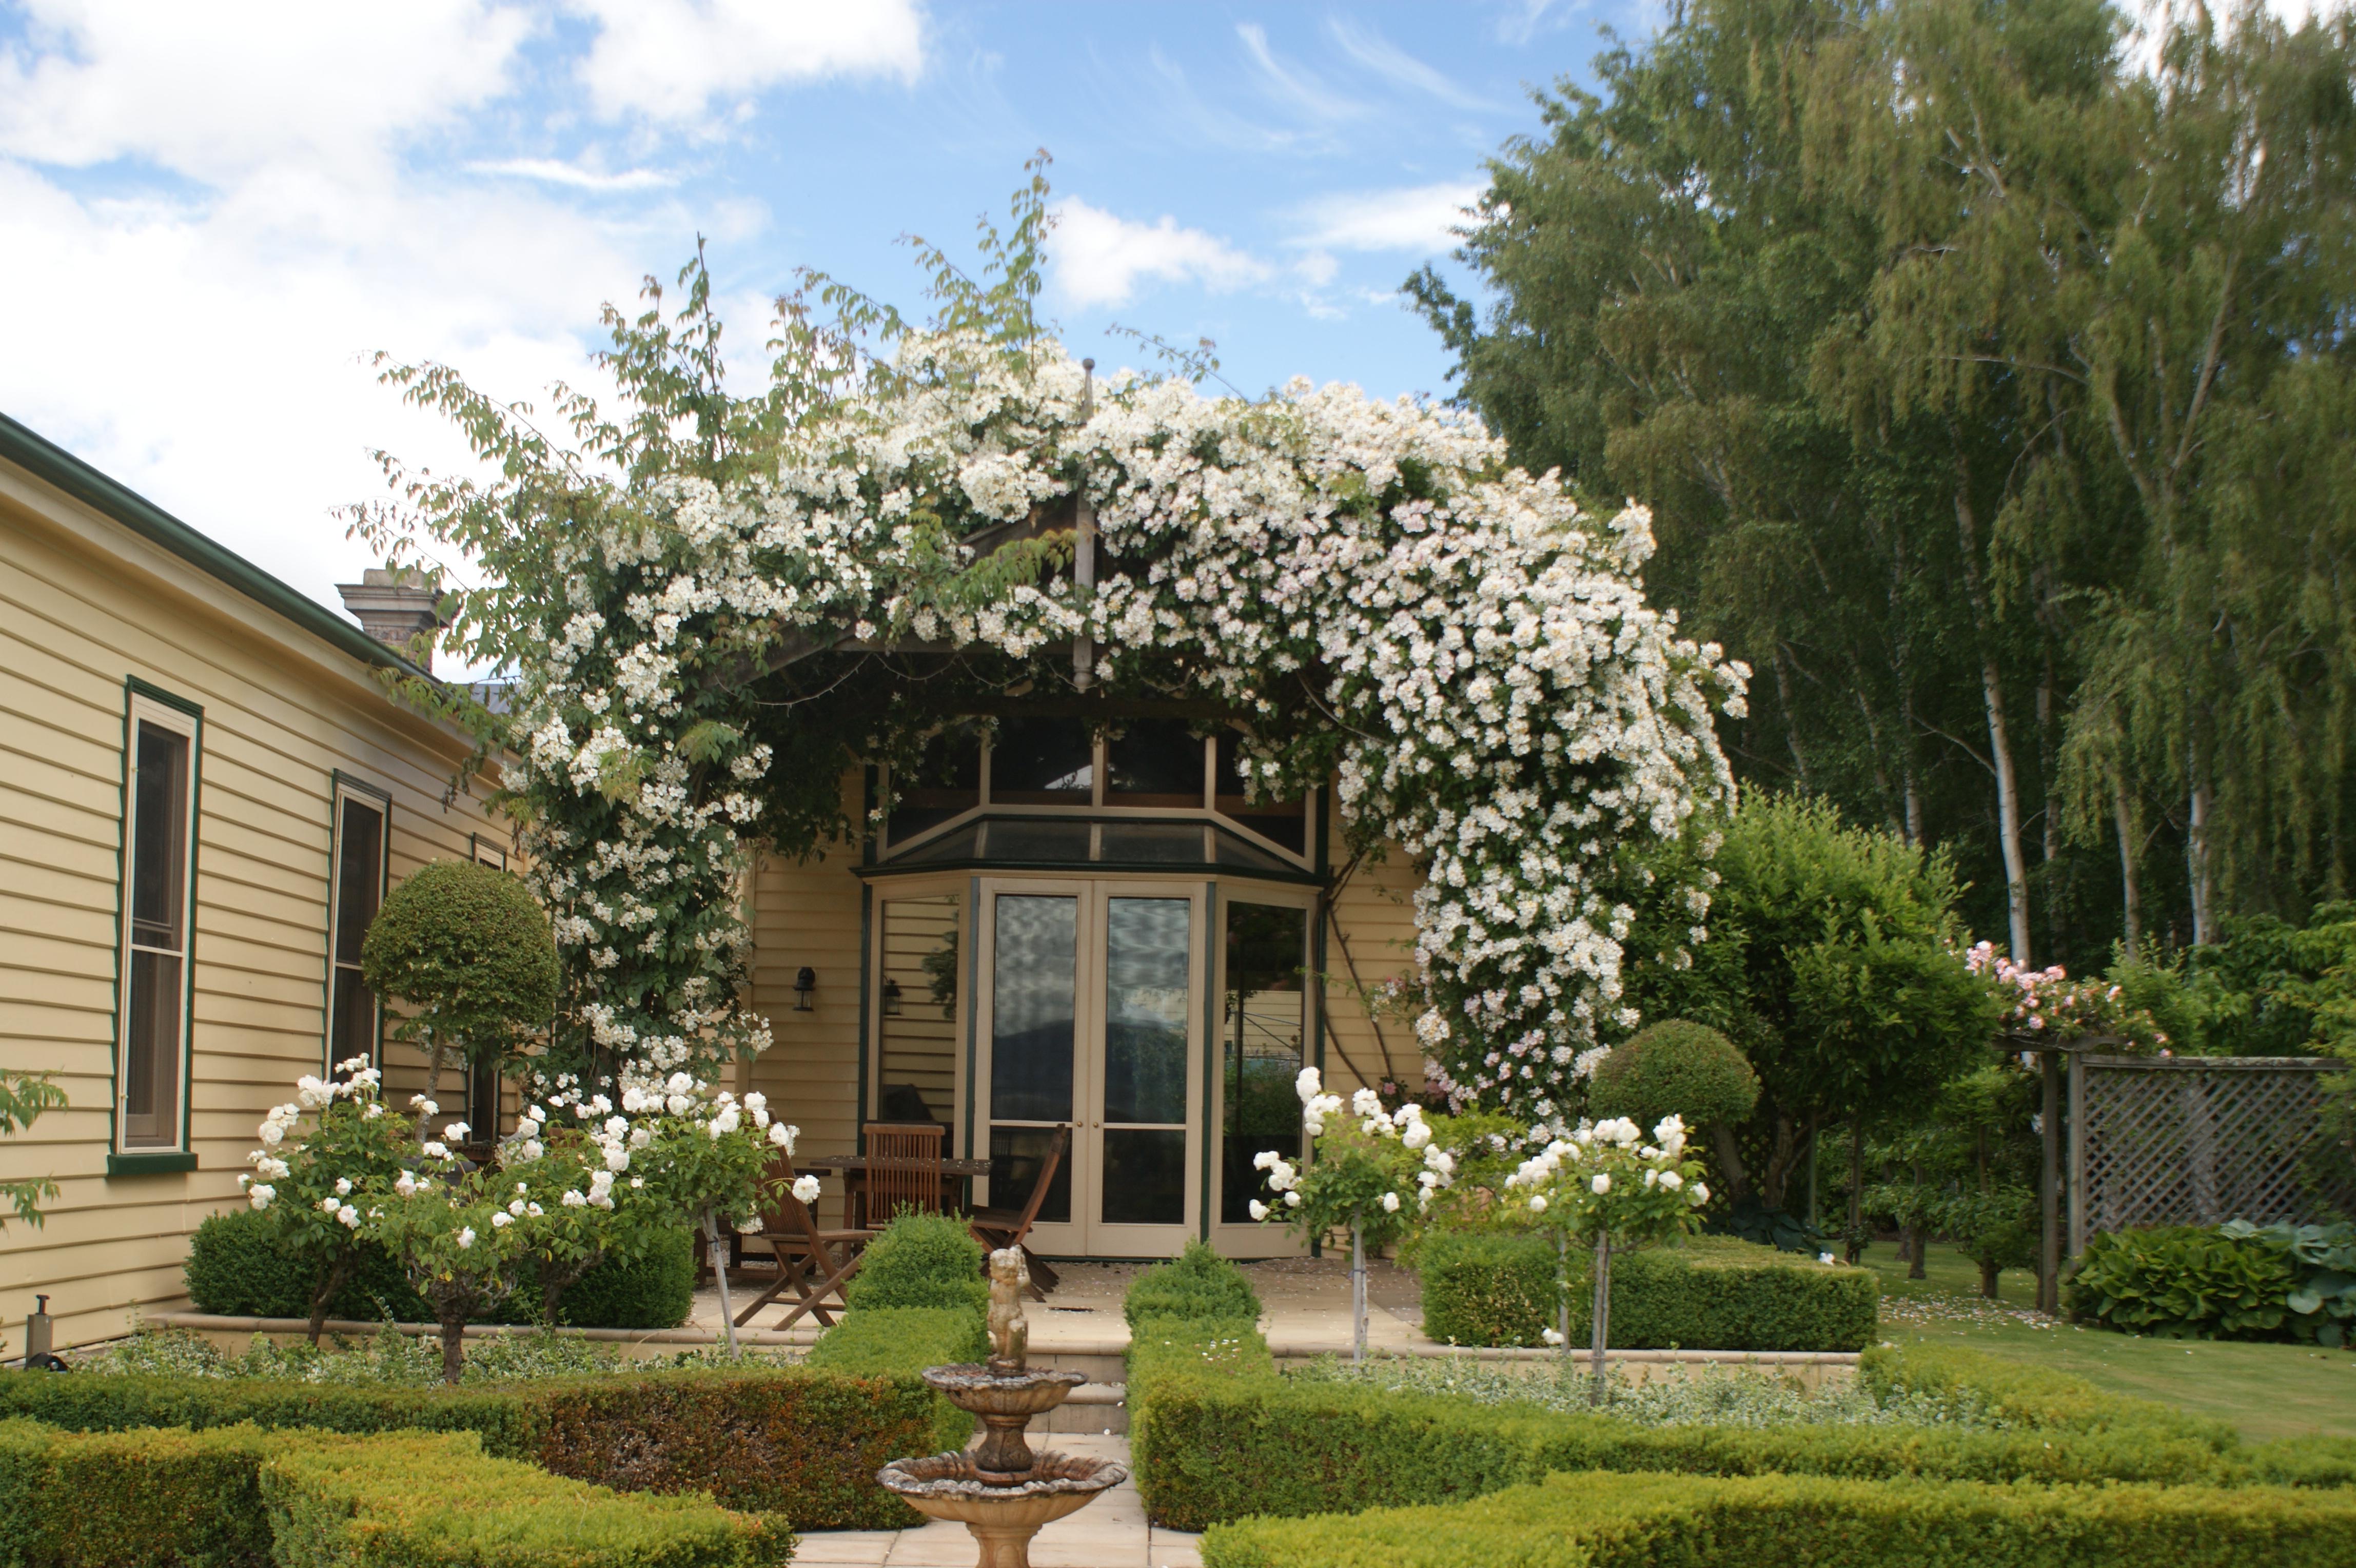 ericvale_roses_tasmanian_rose_gardens_1